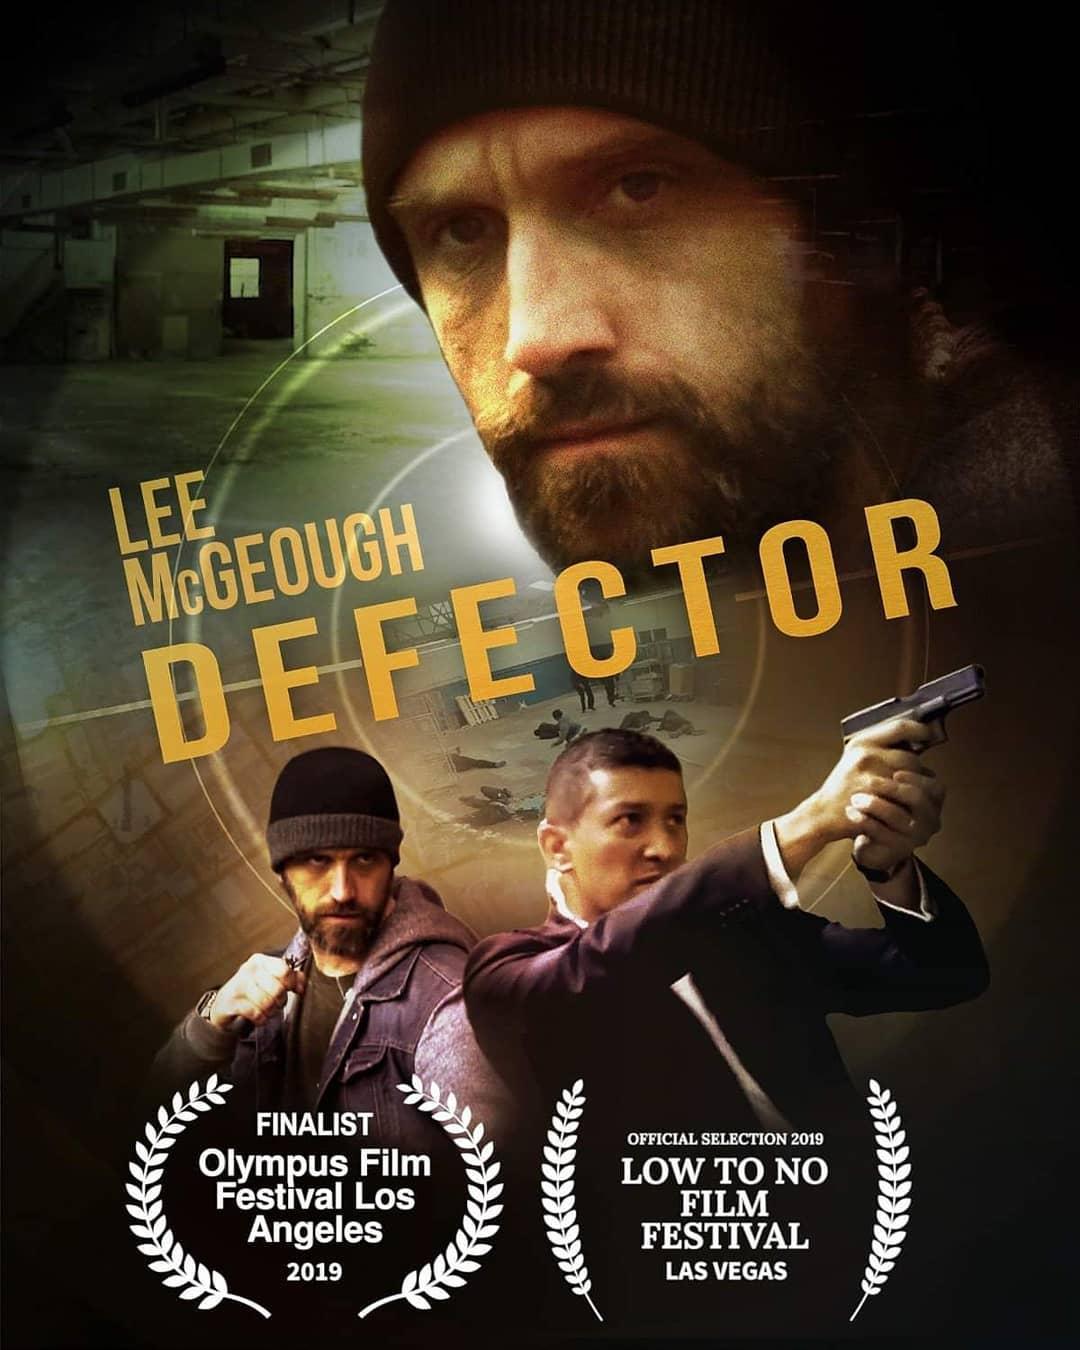 Defector Festival Poster